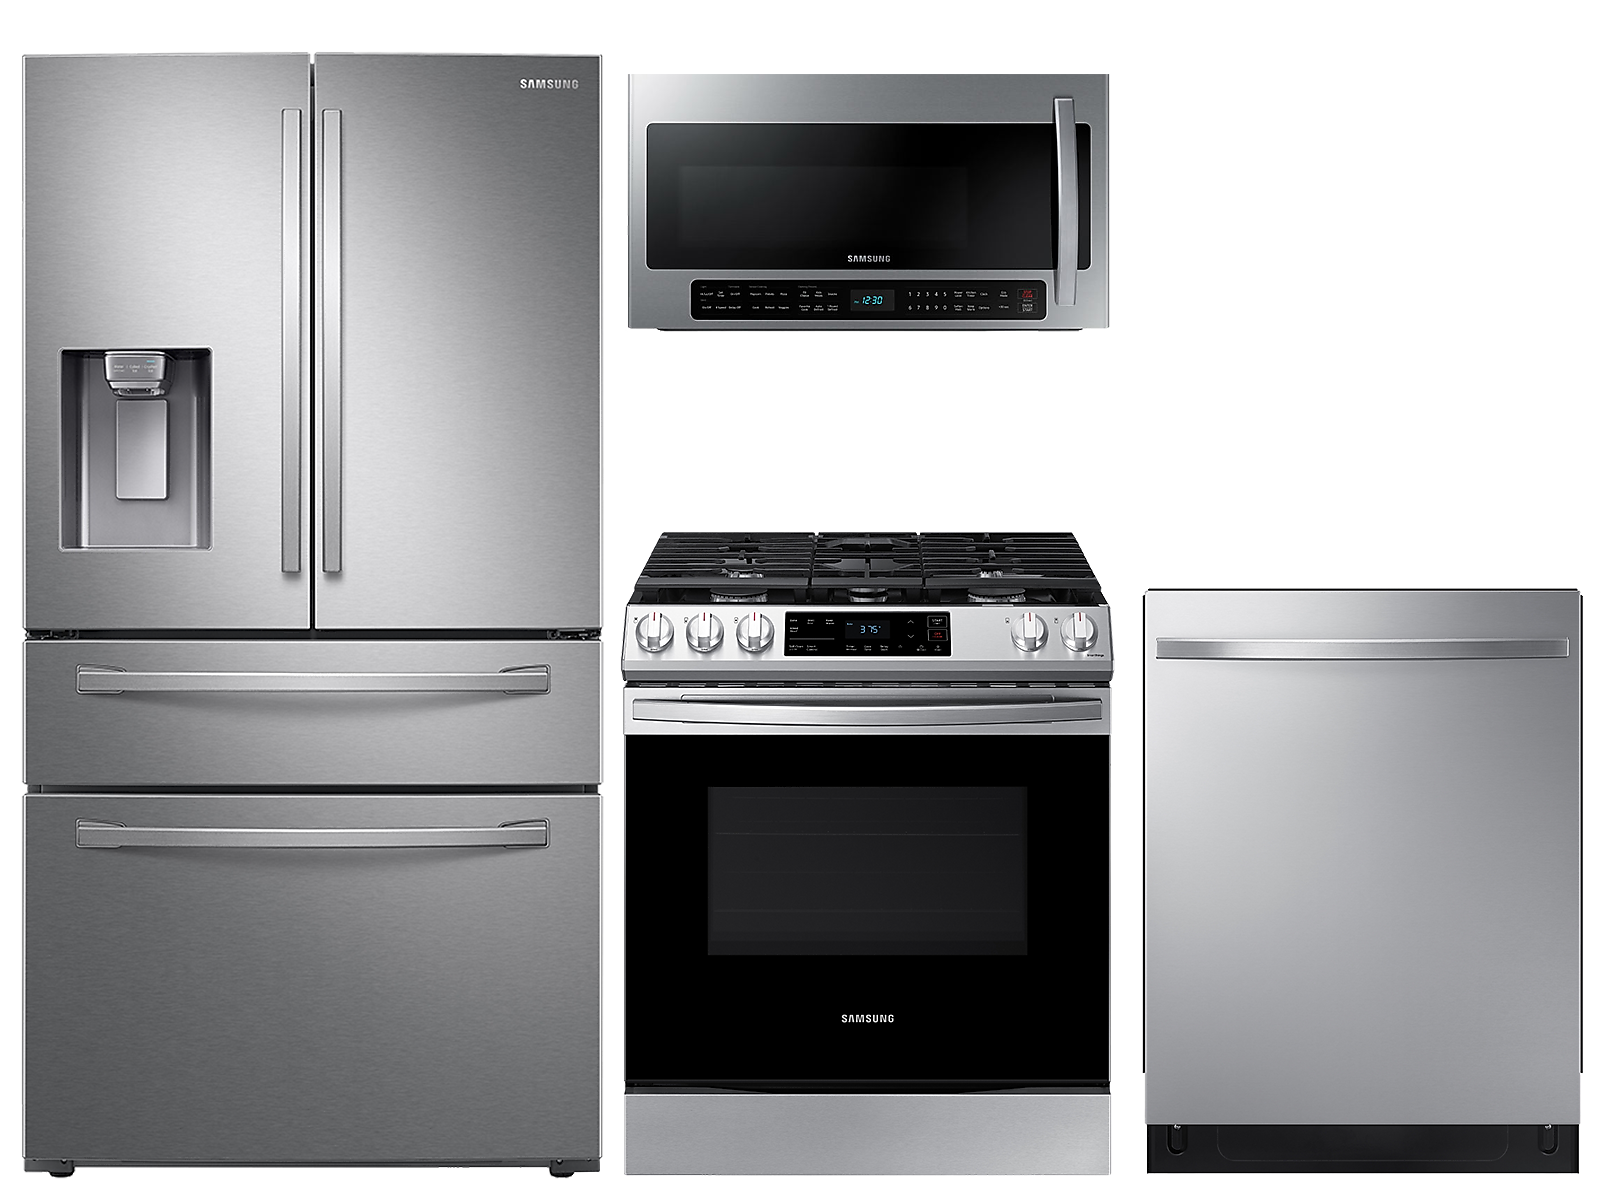 Samsung coupon: Samsung 28 cu. ft. 4-door refrigerator, gas range, 2.1 cu. ft. microwave and modern-look dishwasher package(BNDL-1612910285883)